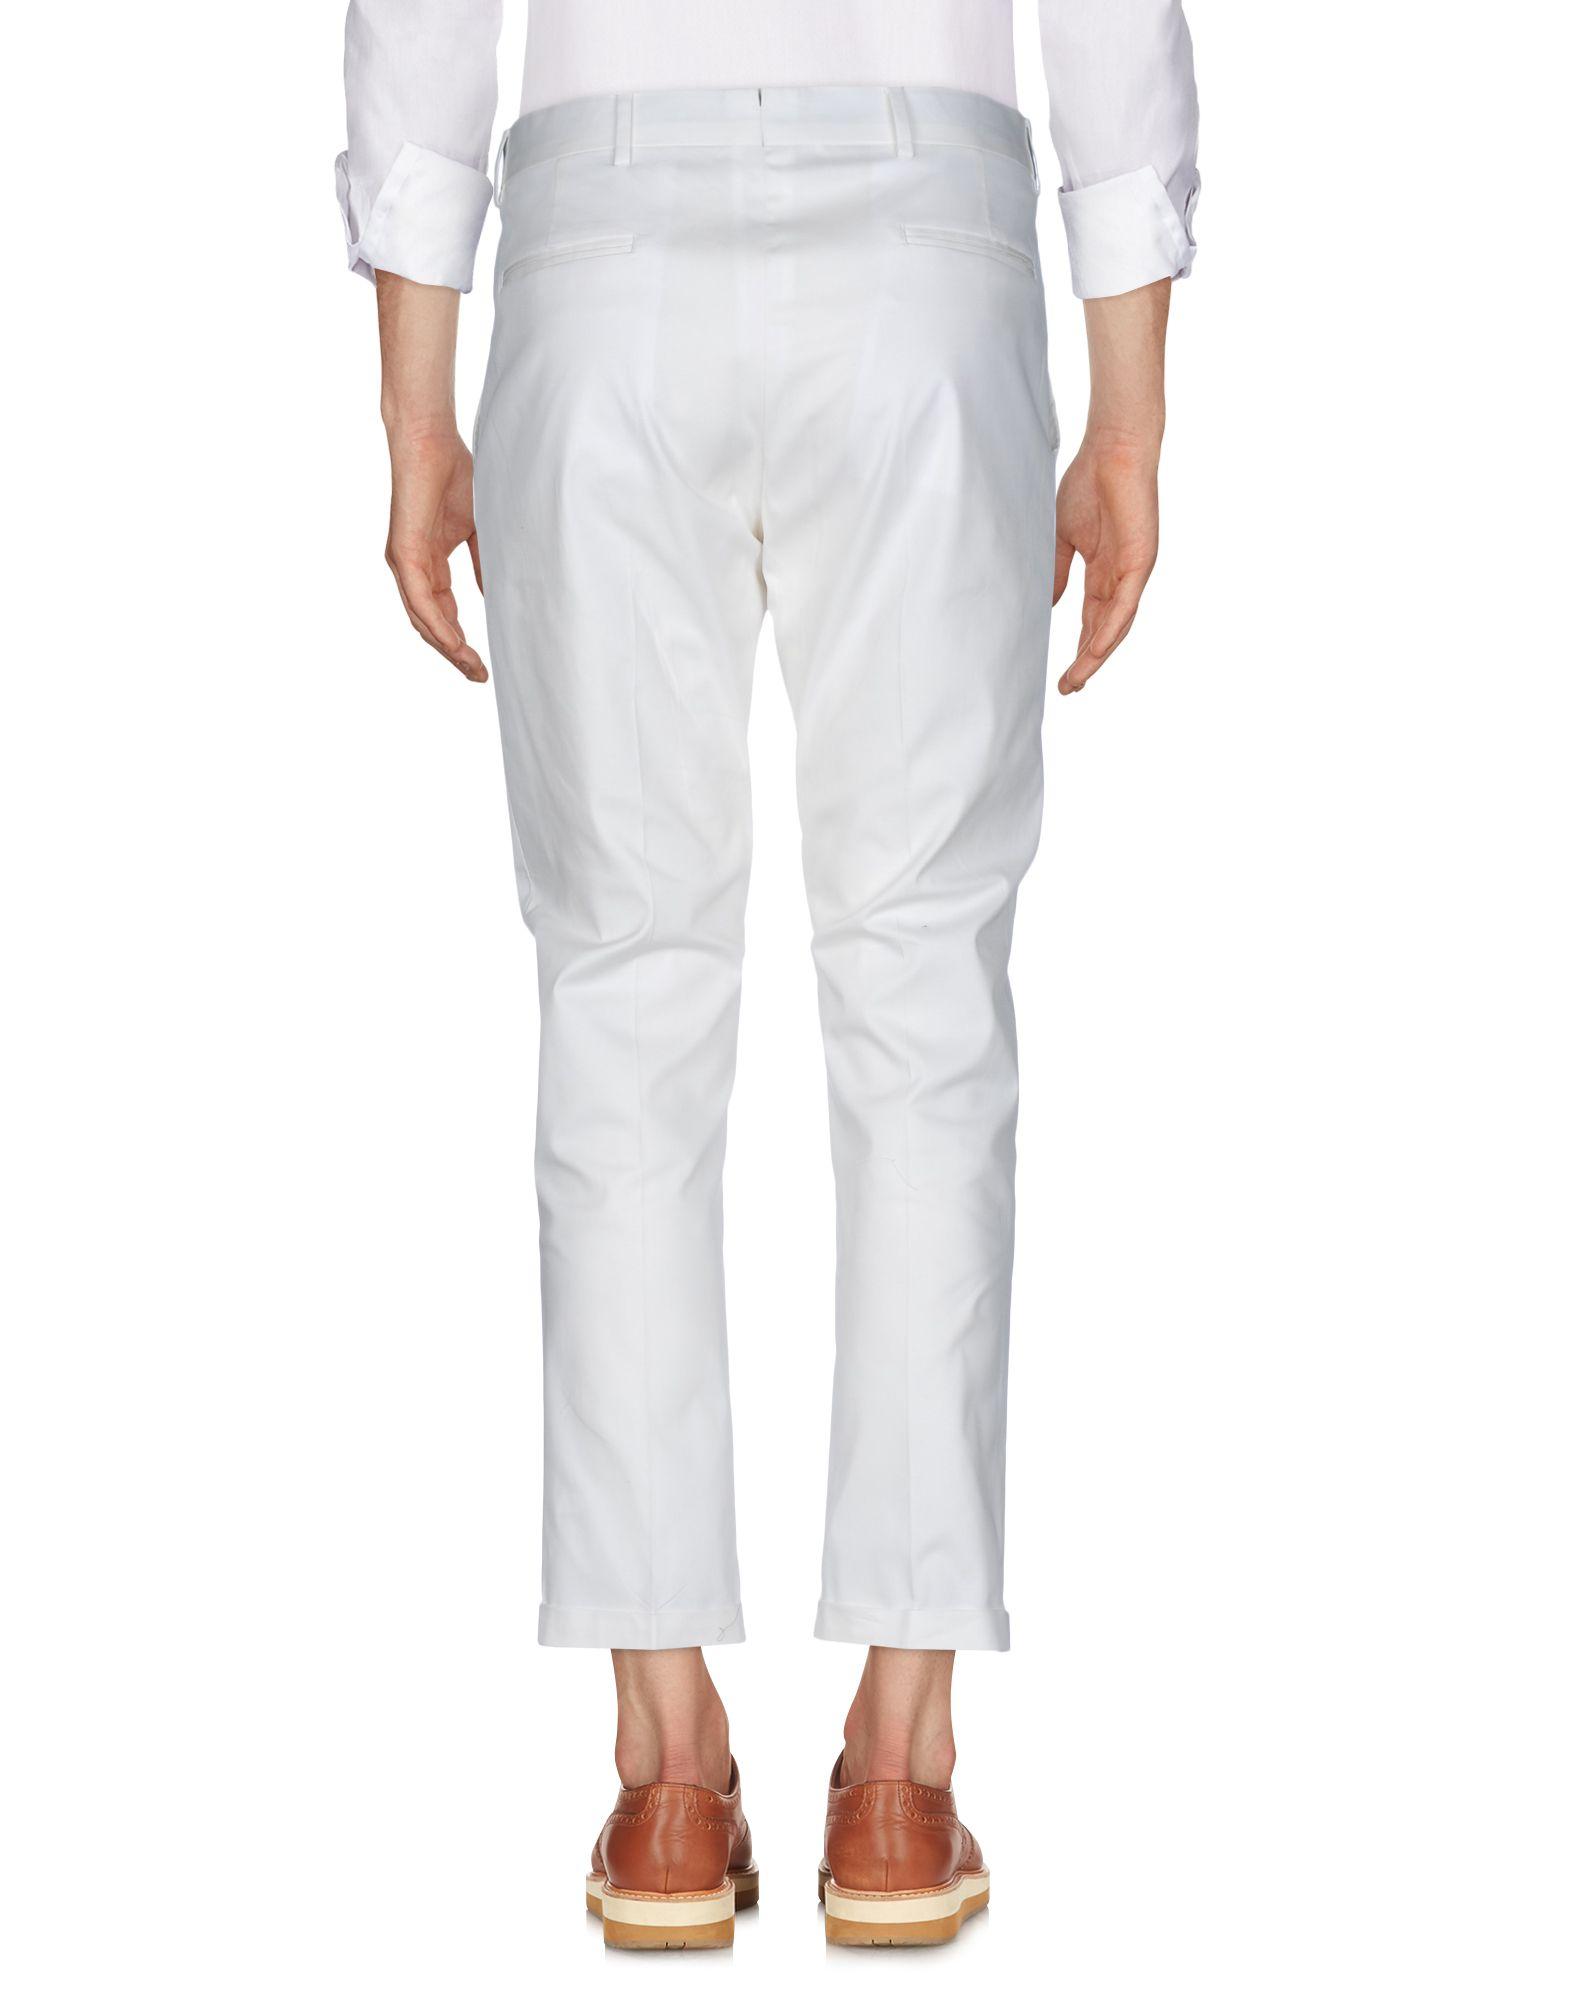 Pantalone 26.7 26.7 Pantalone Twentysixseven Uomo - 13112111PC ea7300